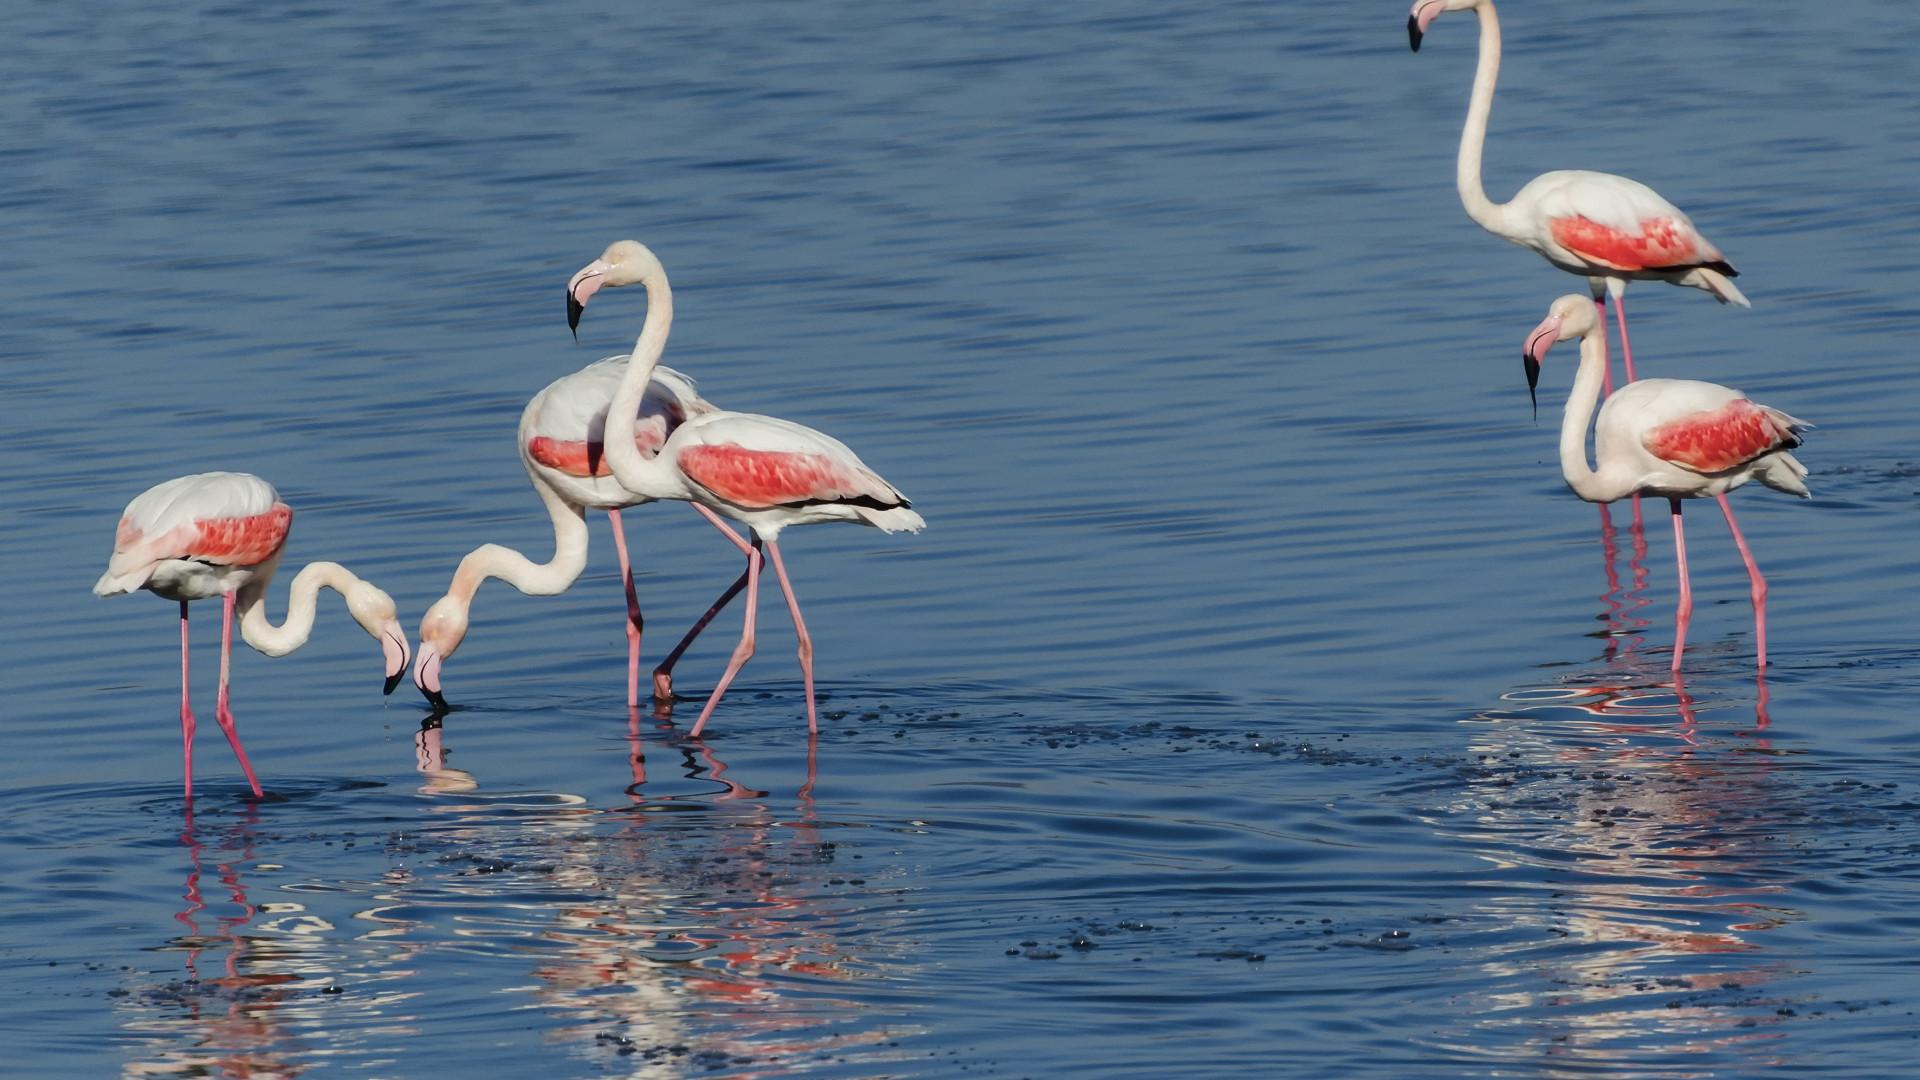 Thrace, Greece | Flamingos on Lake Vistonida